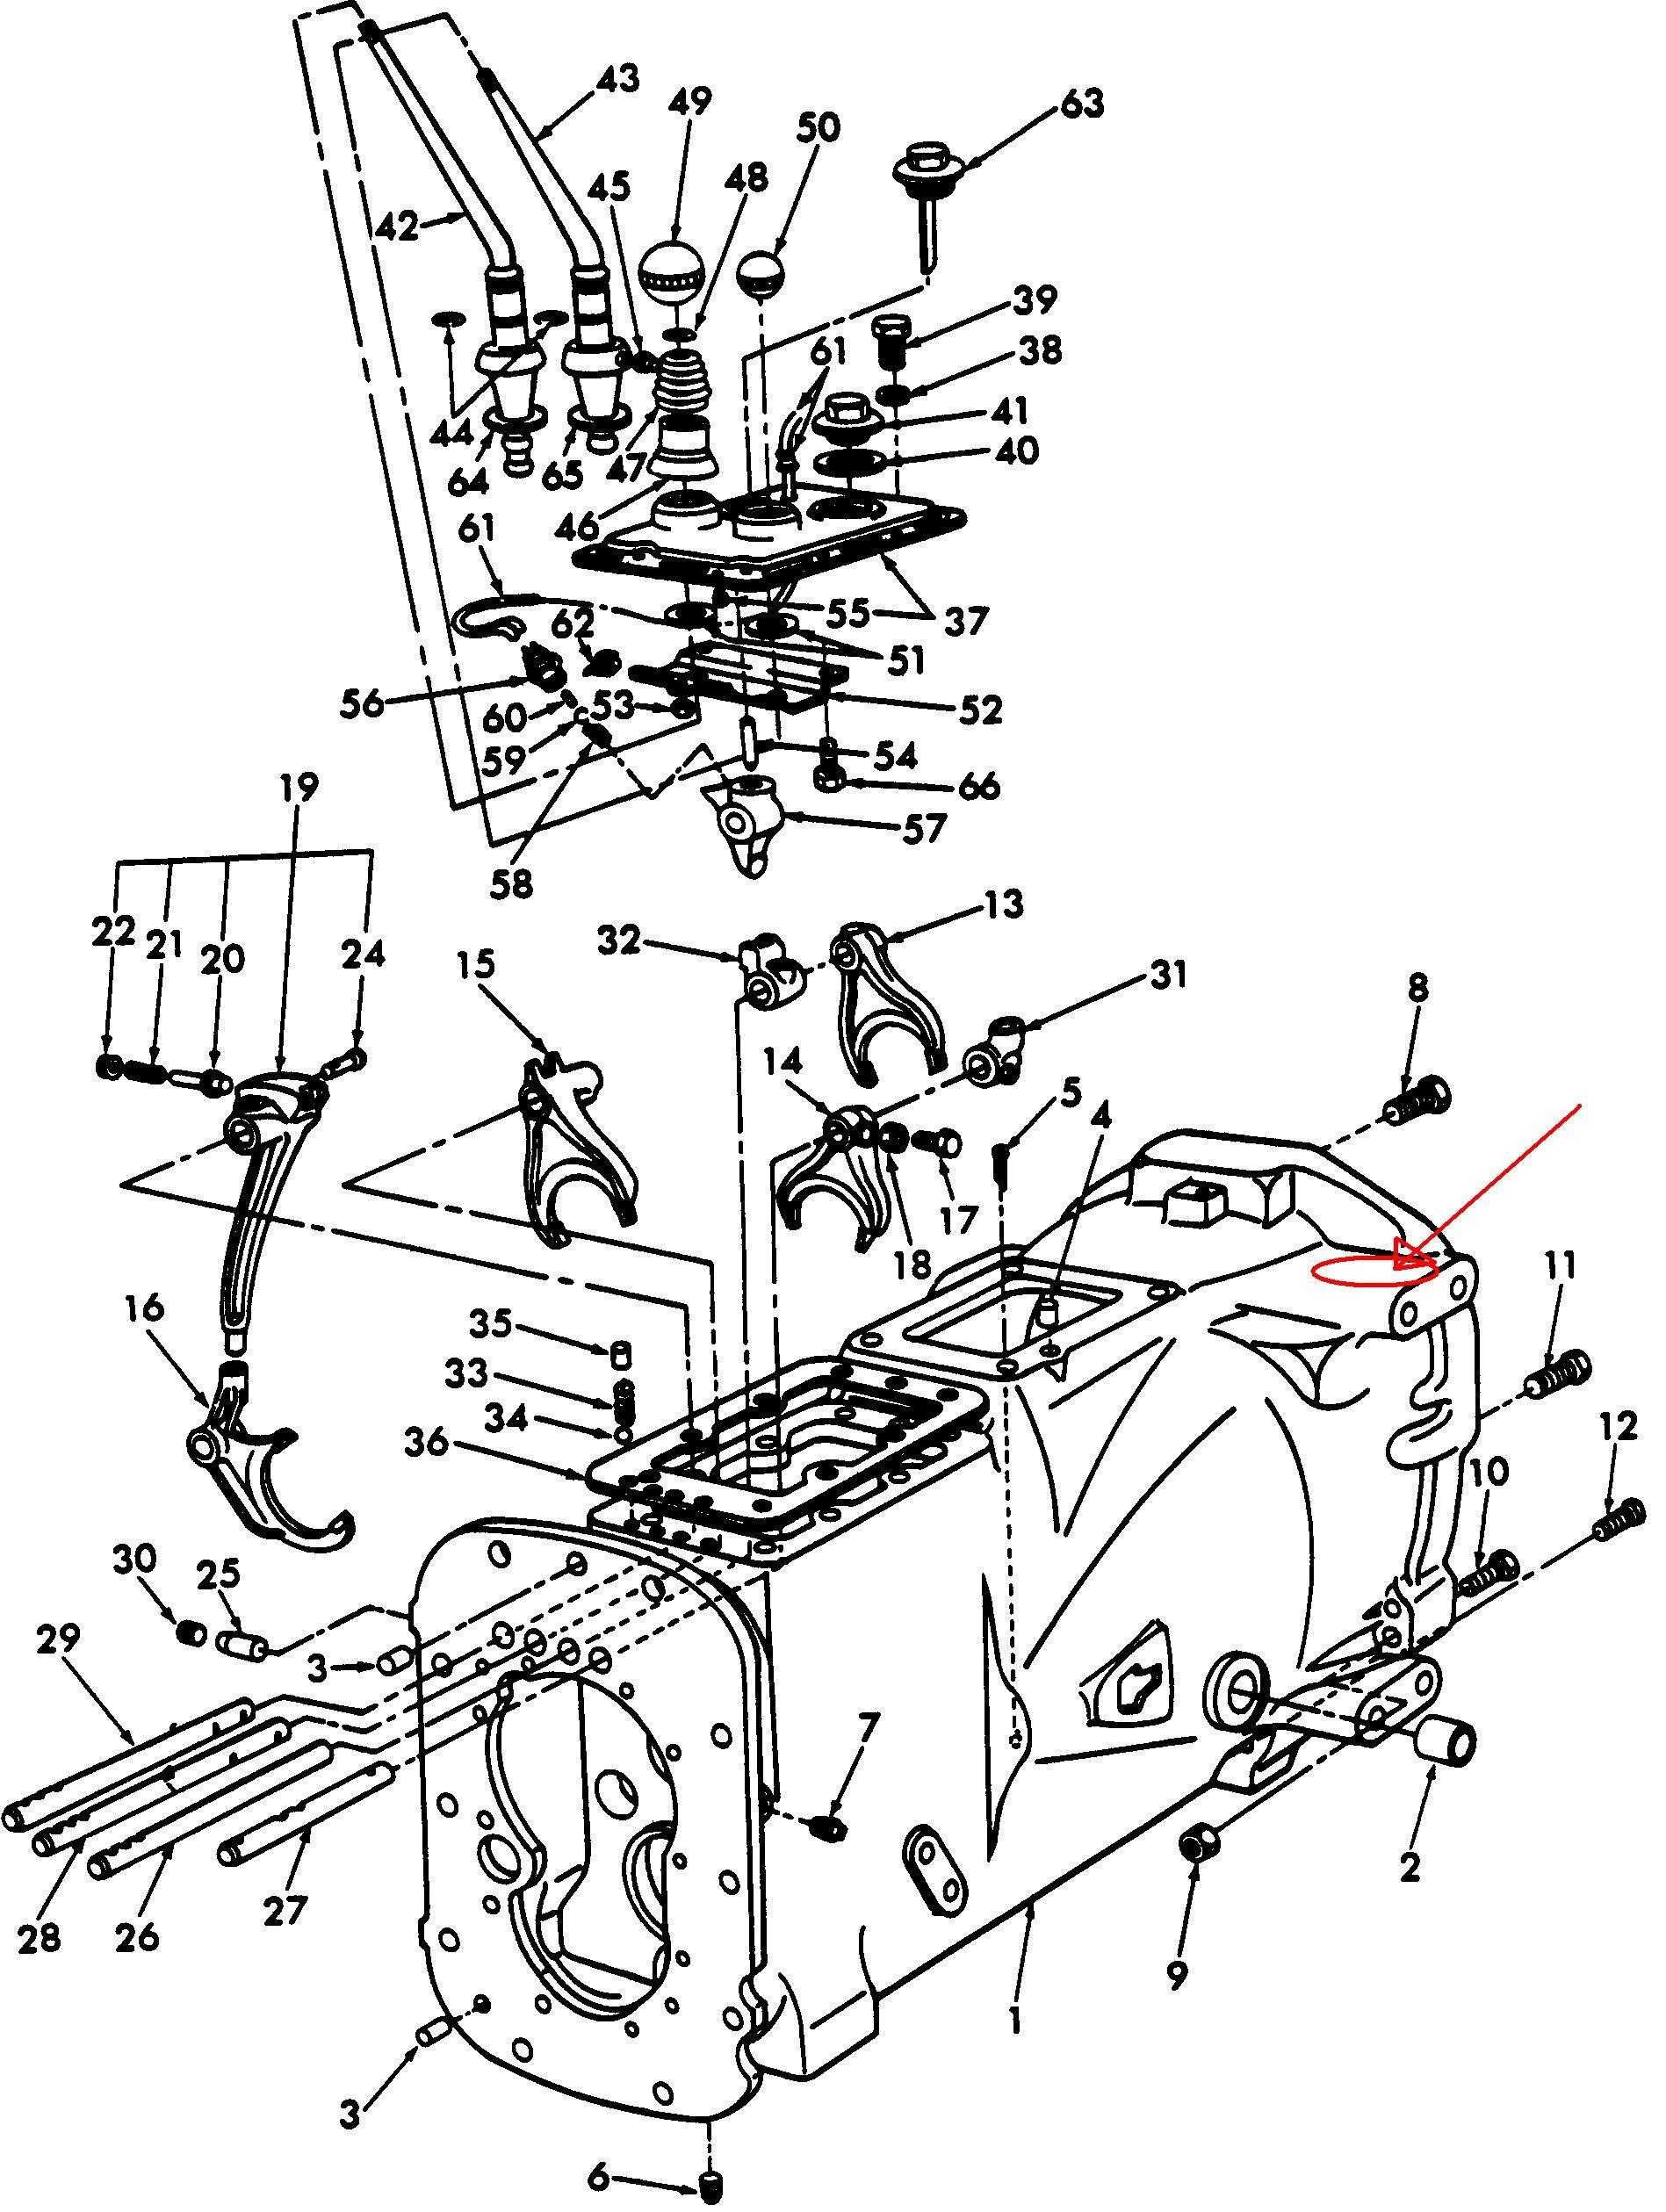 Brilliant 1950 Ford Tractor Wiring Diagram Wiring Diagram Tutorial Wiring Cloud Timewinrebemohammedshrineorg